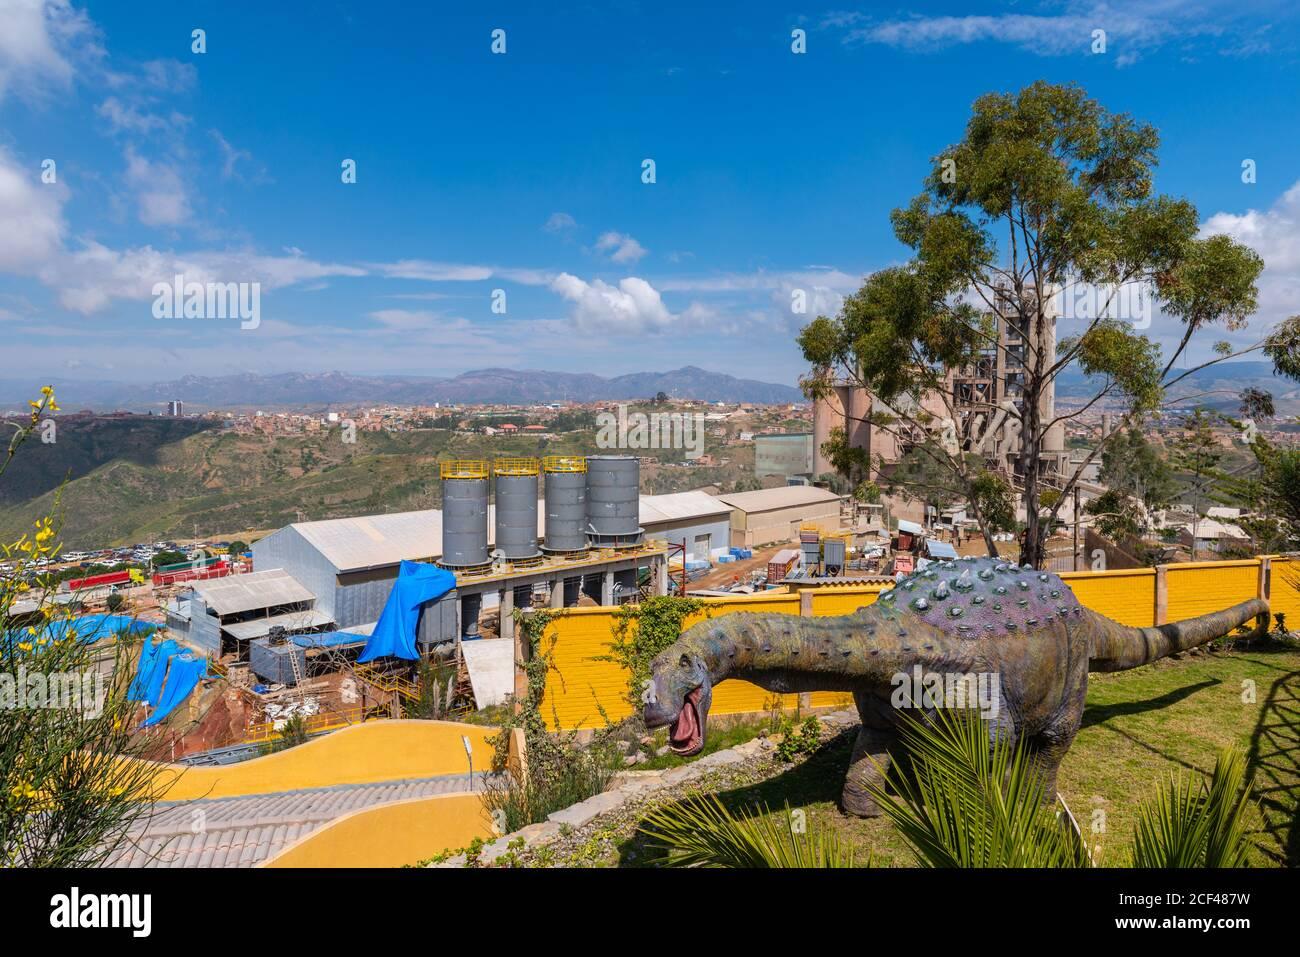 Cement Works Next To Parque Cretacico Near Sucre Sucre Capital Of Bolivia Capital Of The Chuquisaca Department Bolivia Latin America Stock Photo Alamy